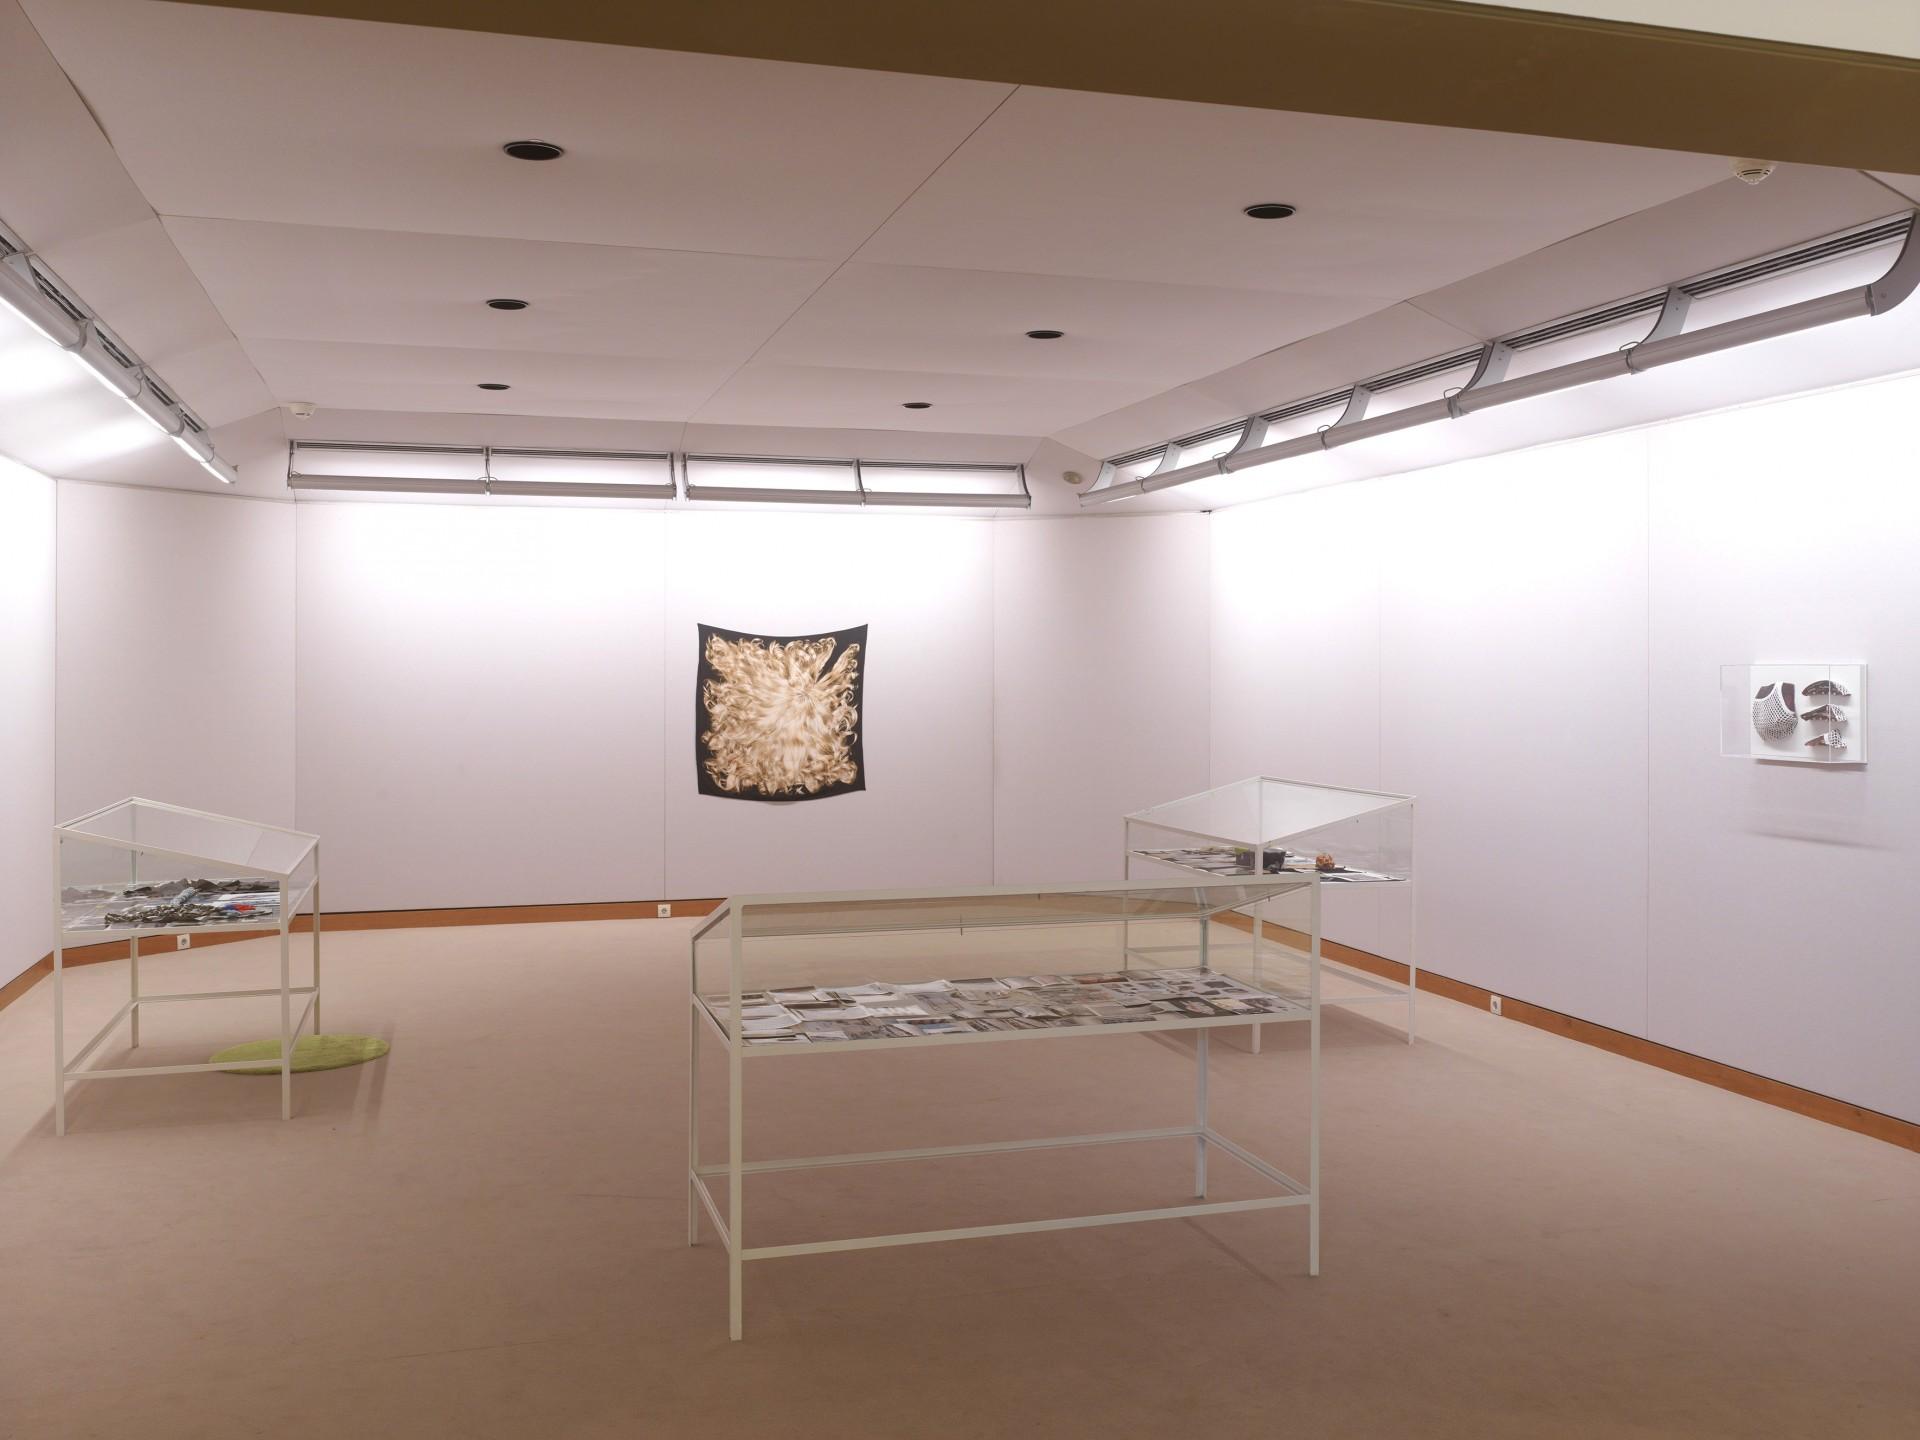 ALEXANDRA BIRCKEN STRETCH, Museum Abteiberg, Mönchengladbach, 26.03. – 25.06.2017